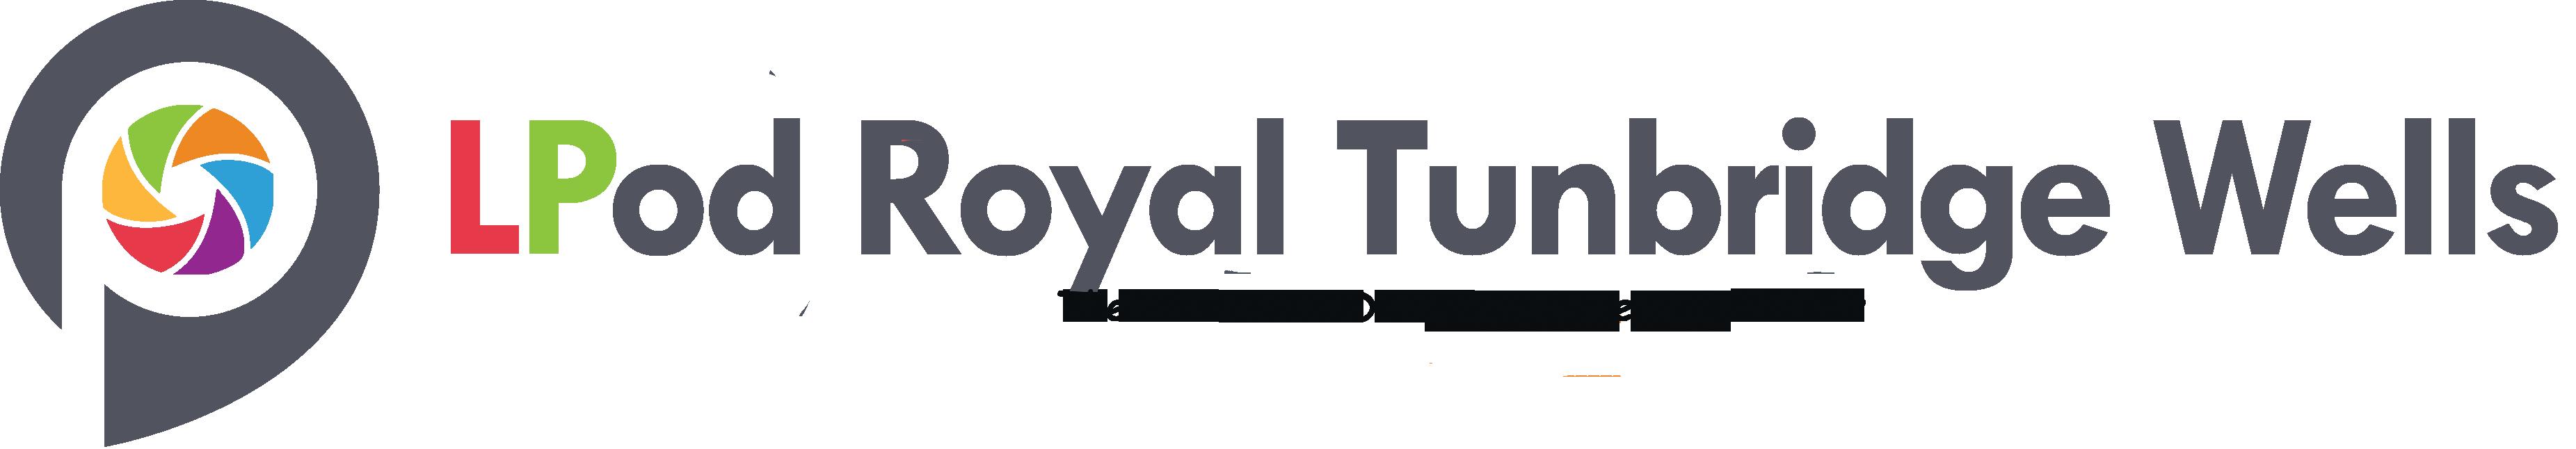 intensive driving courses royal tunbridge wells, one week driving courses royal tunbridge wells , fast pass driving courses royal tunbridge wells